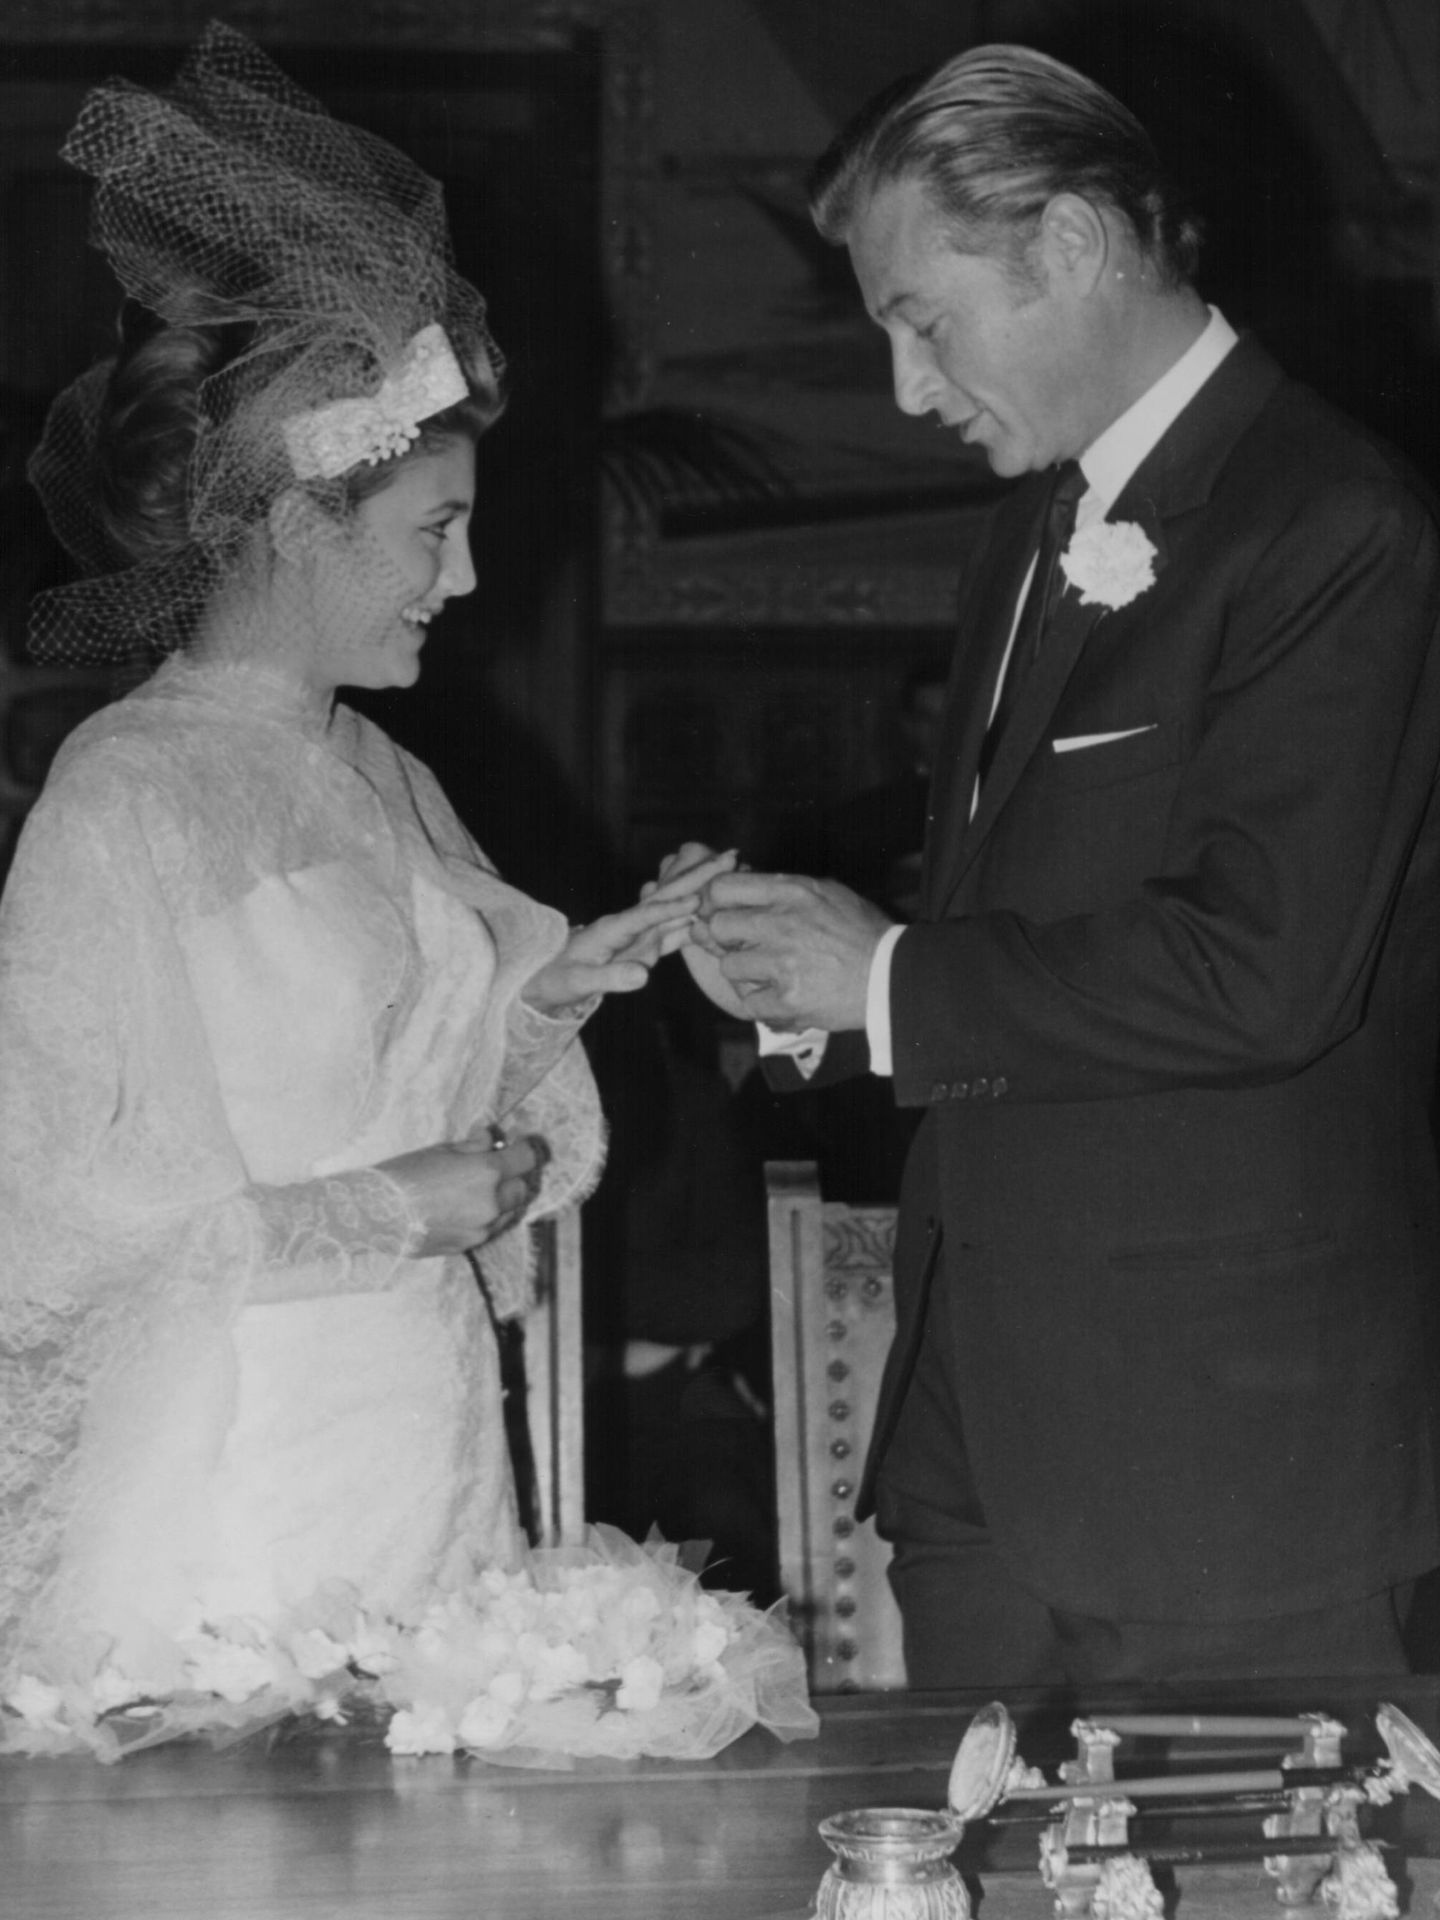 Foto de boda de Lex Barker y Tita Cervera. (Getty)